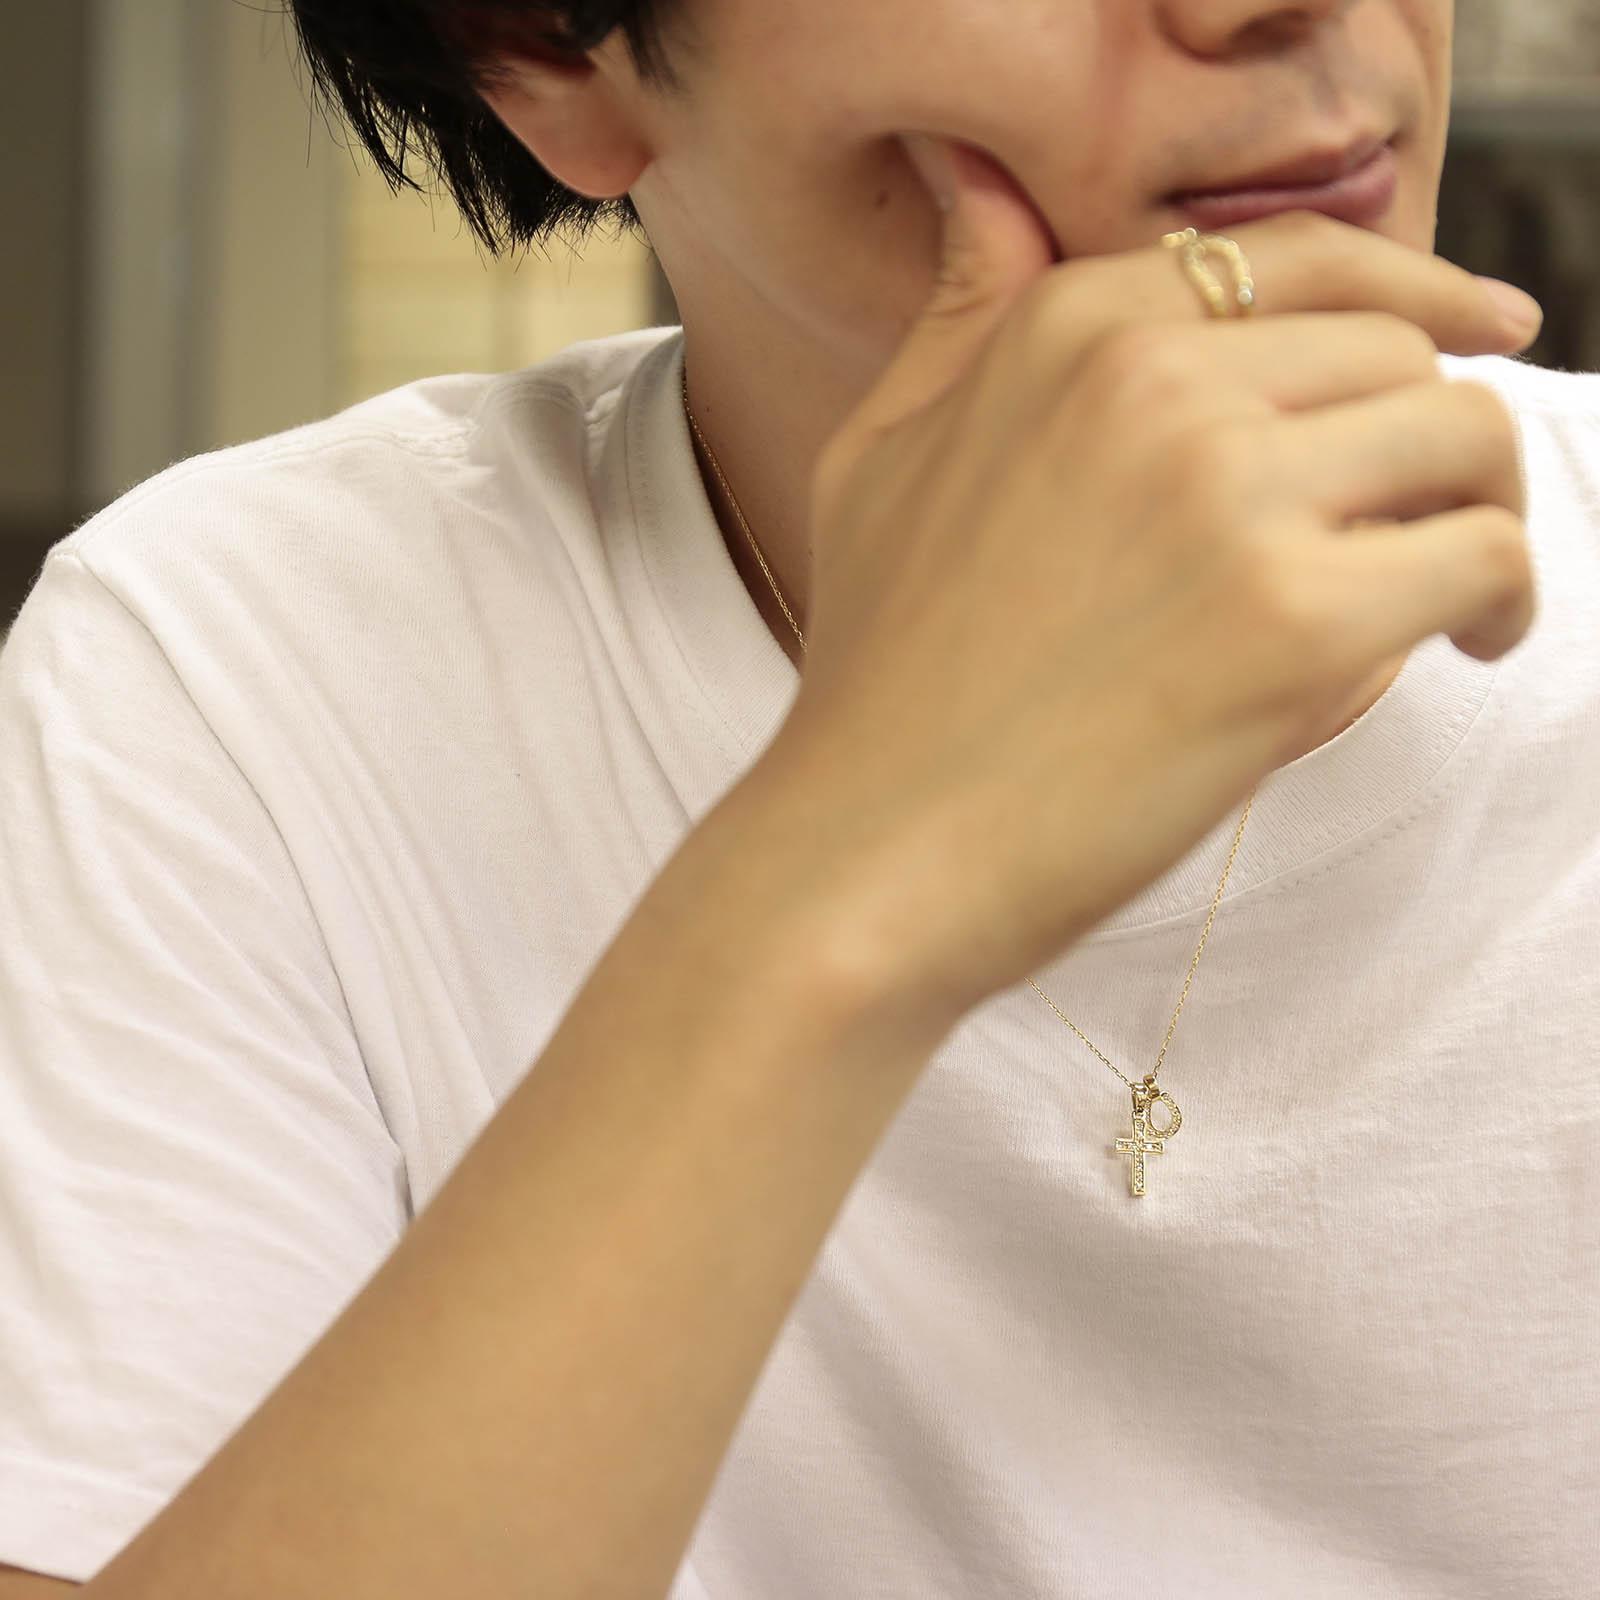 S.O.S fp恵比寿本店、WEB限定 Small Gravity Cross Necklace w/Horseshoe - K18Yellow Gold w/Diamond